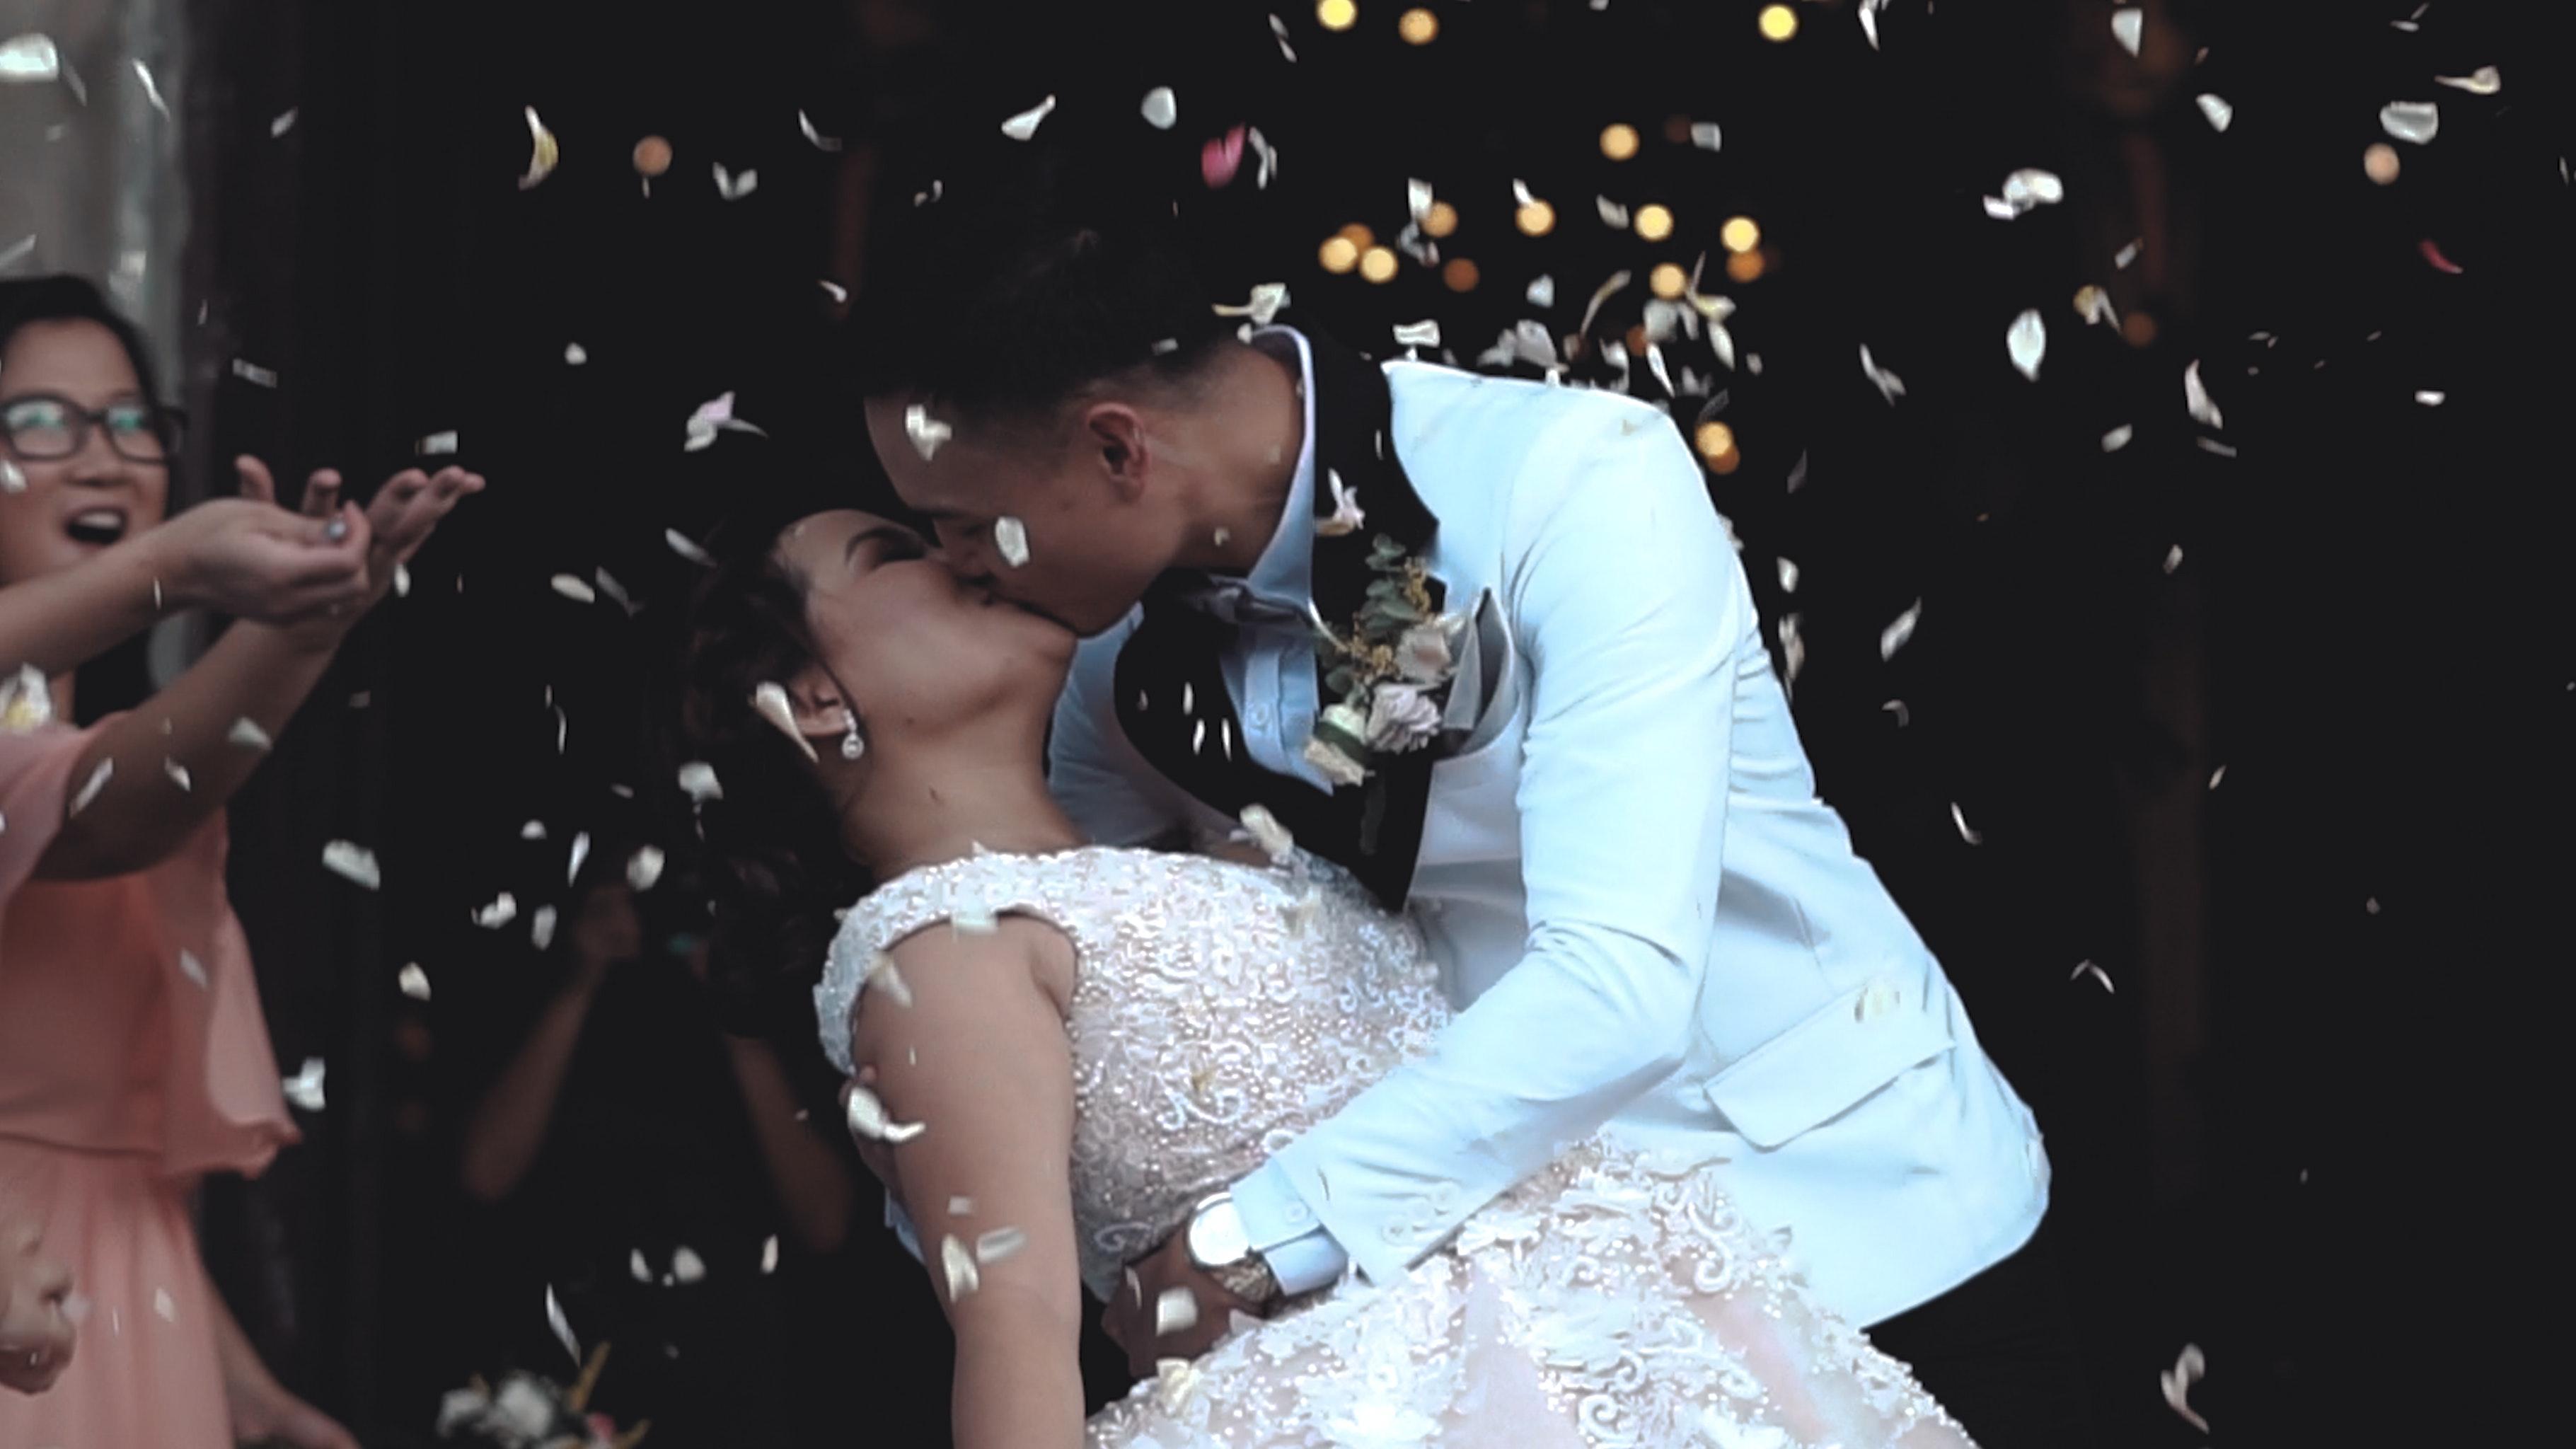 https://secureservercdn.net/45.40.150.47/gzg.5ed.myftpupload.com/wp-content/uploads/2018/12/adult-bride-celebration-1311409.jpg?time=1589572012